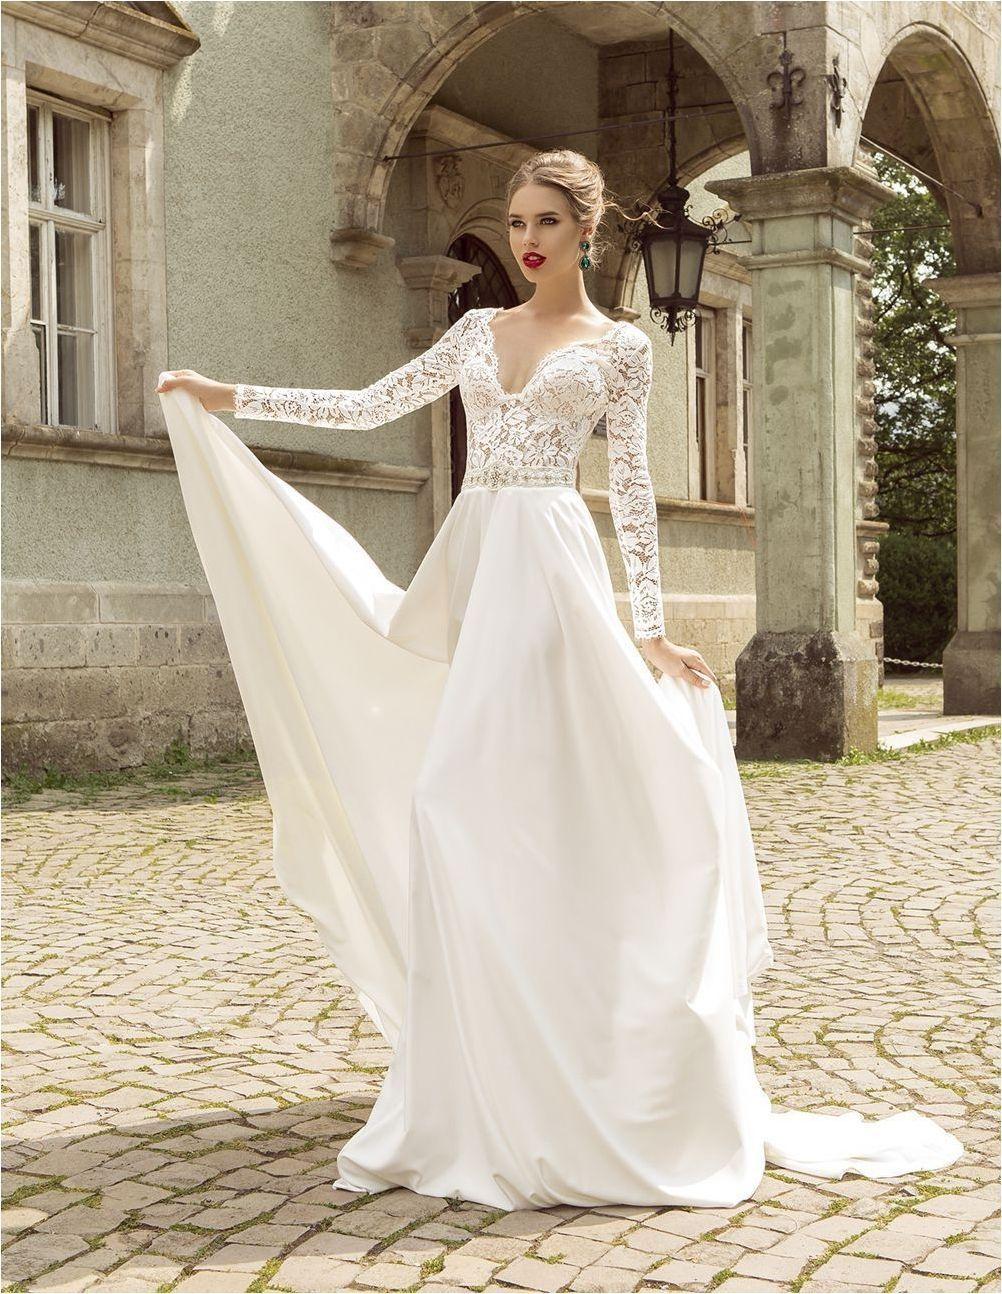 Pin by susan mcevoy on bridal in pinterest wedding dresses